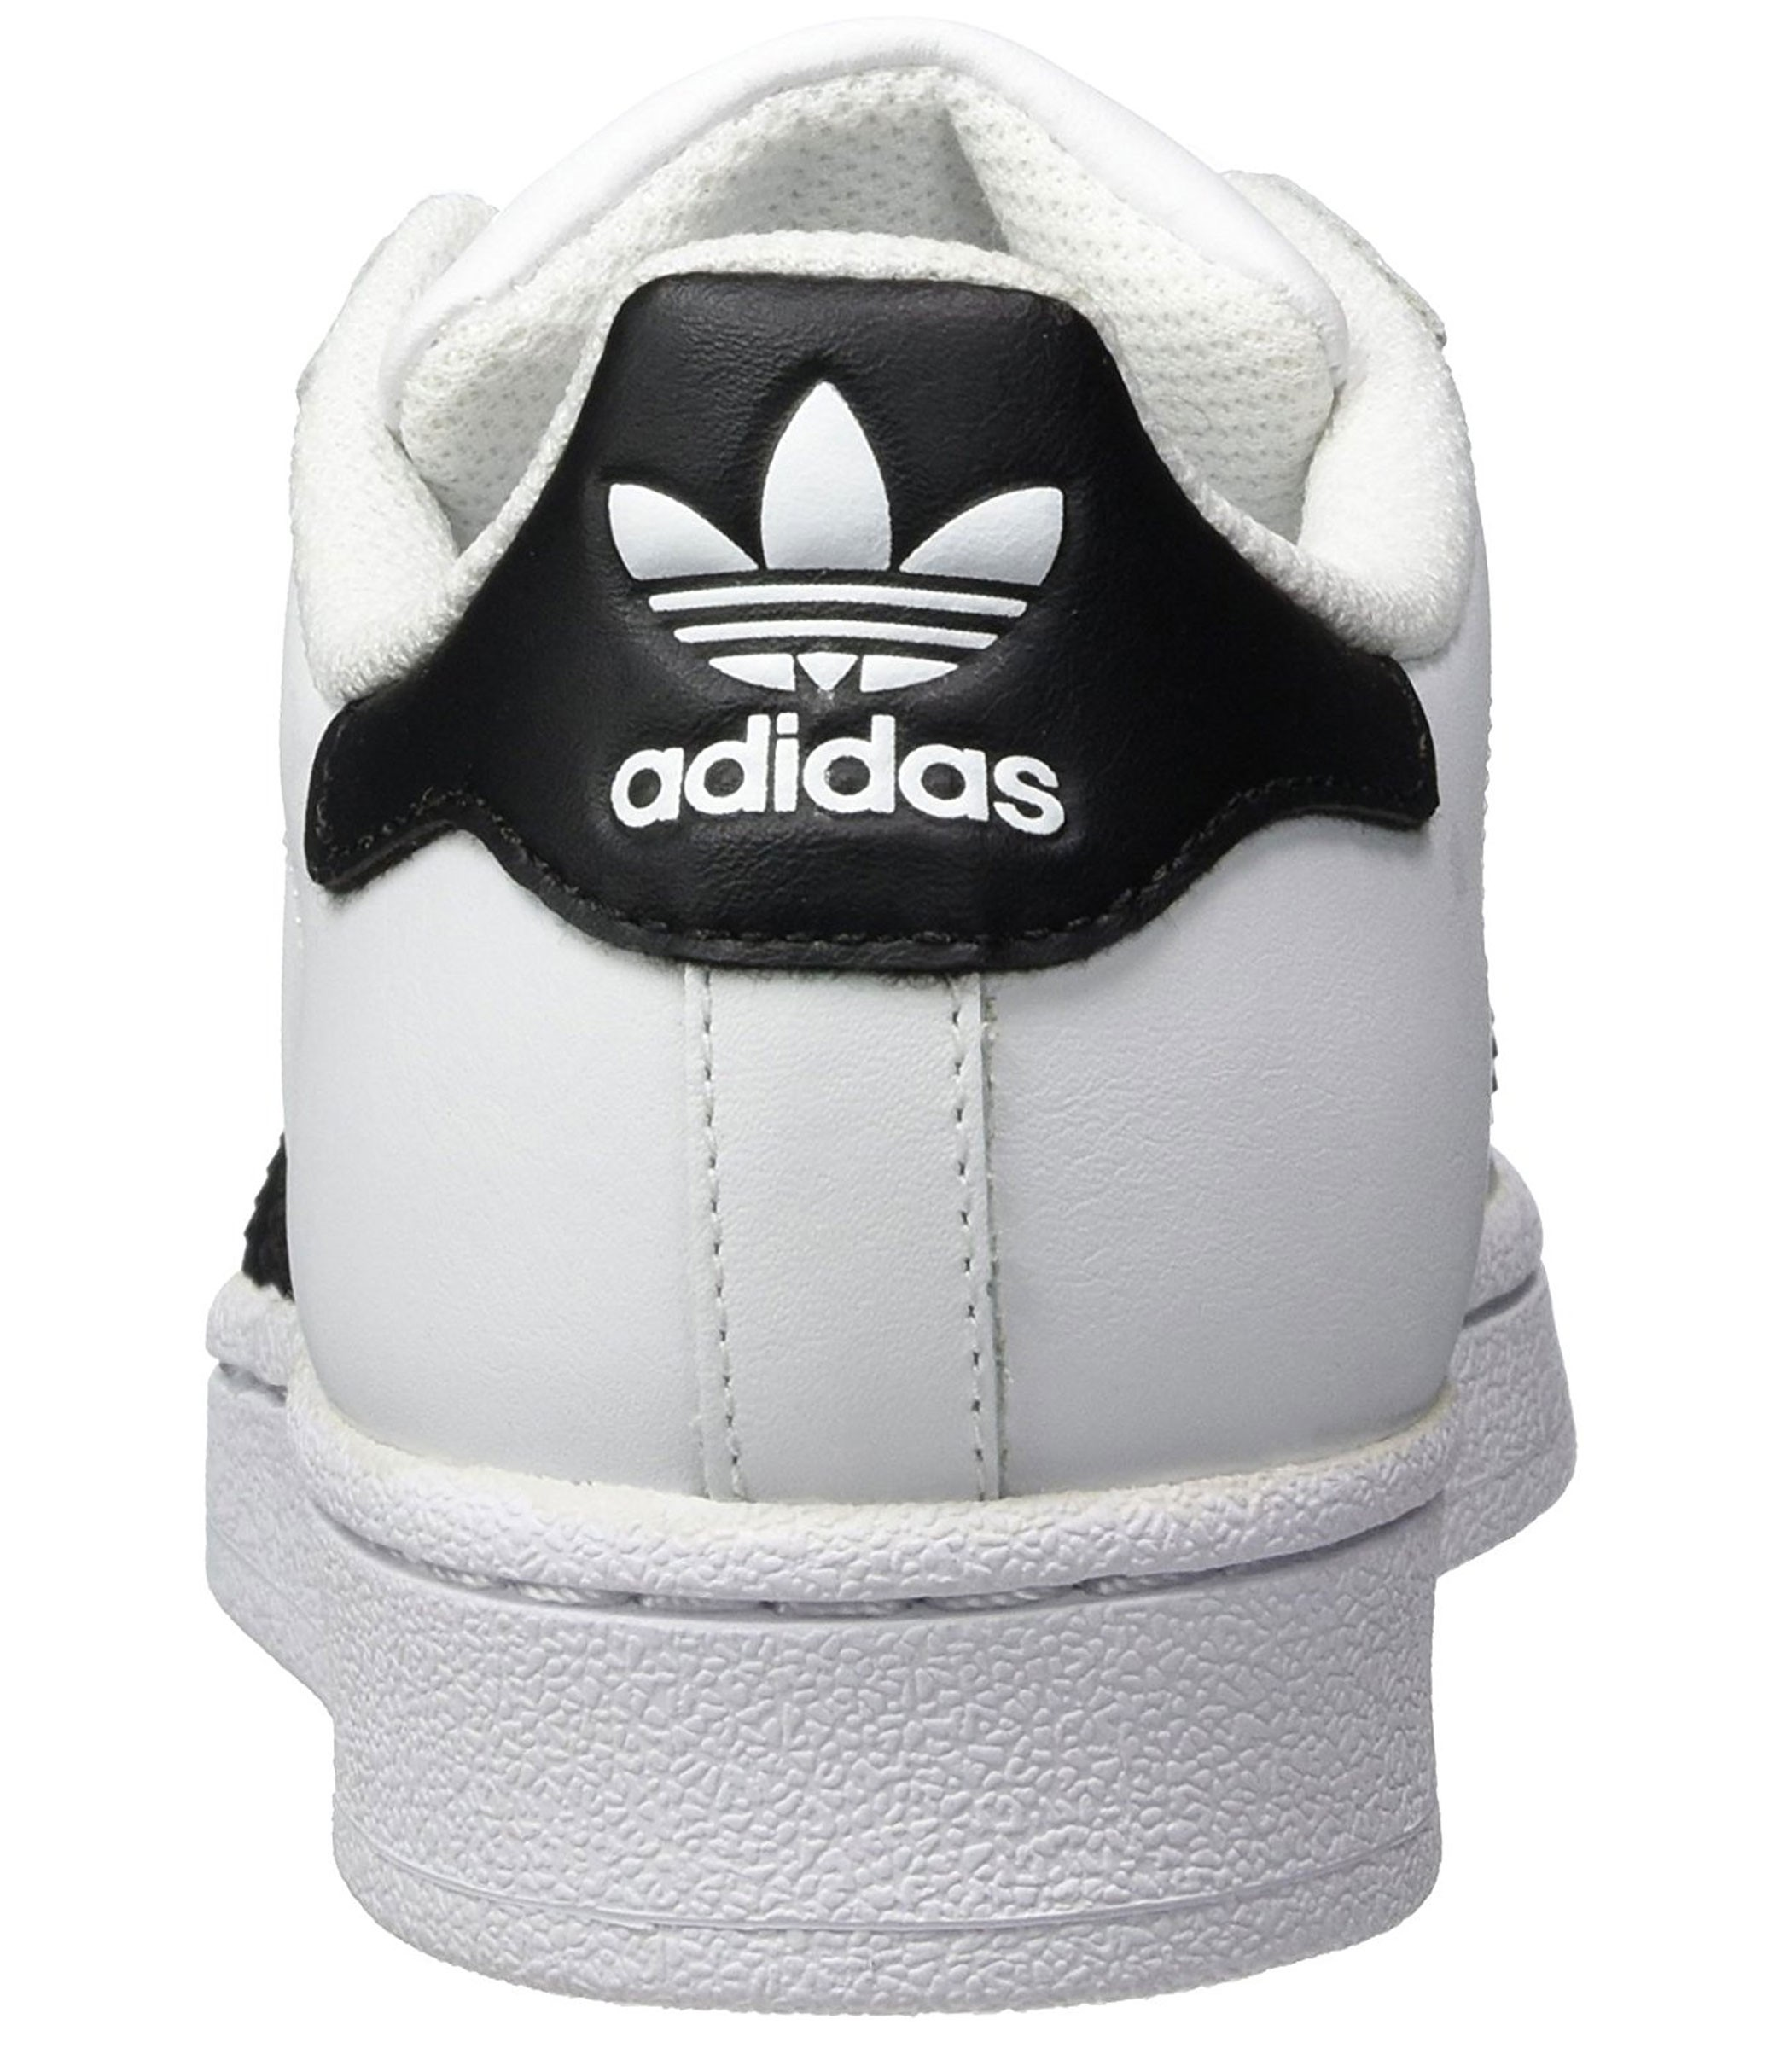 outlet store 85b36 80ef6 Scarpe Sneakers Adidas SUPERSTAR J da ragazzo ragazza rif. C77154